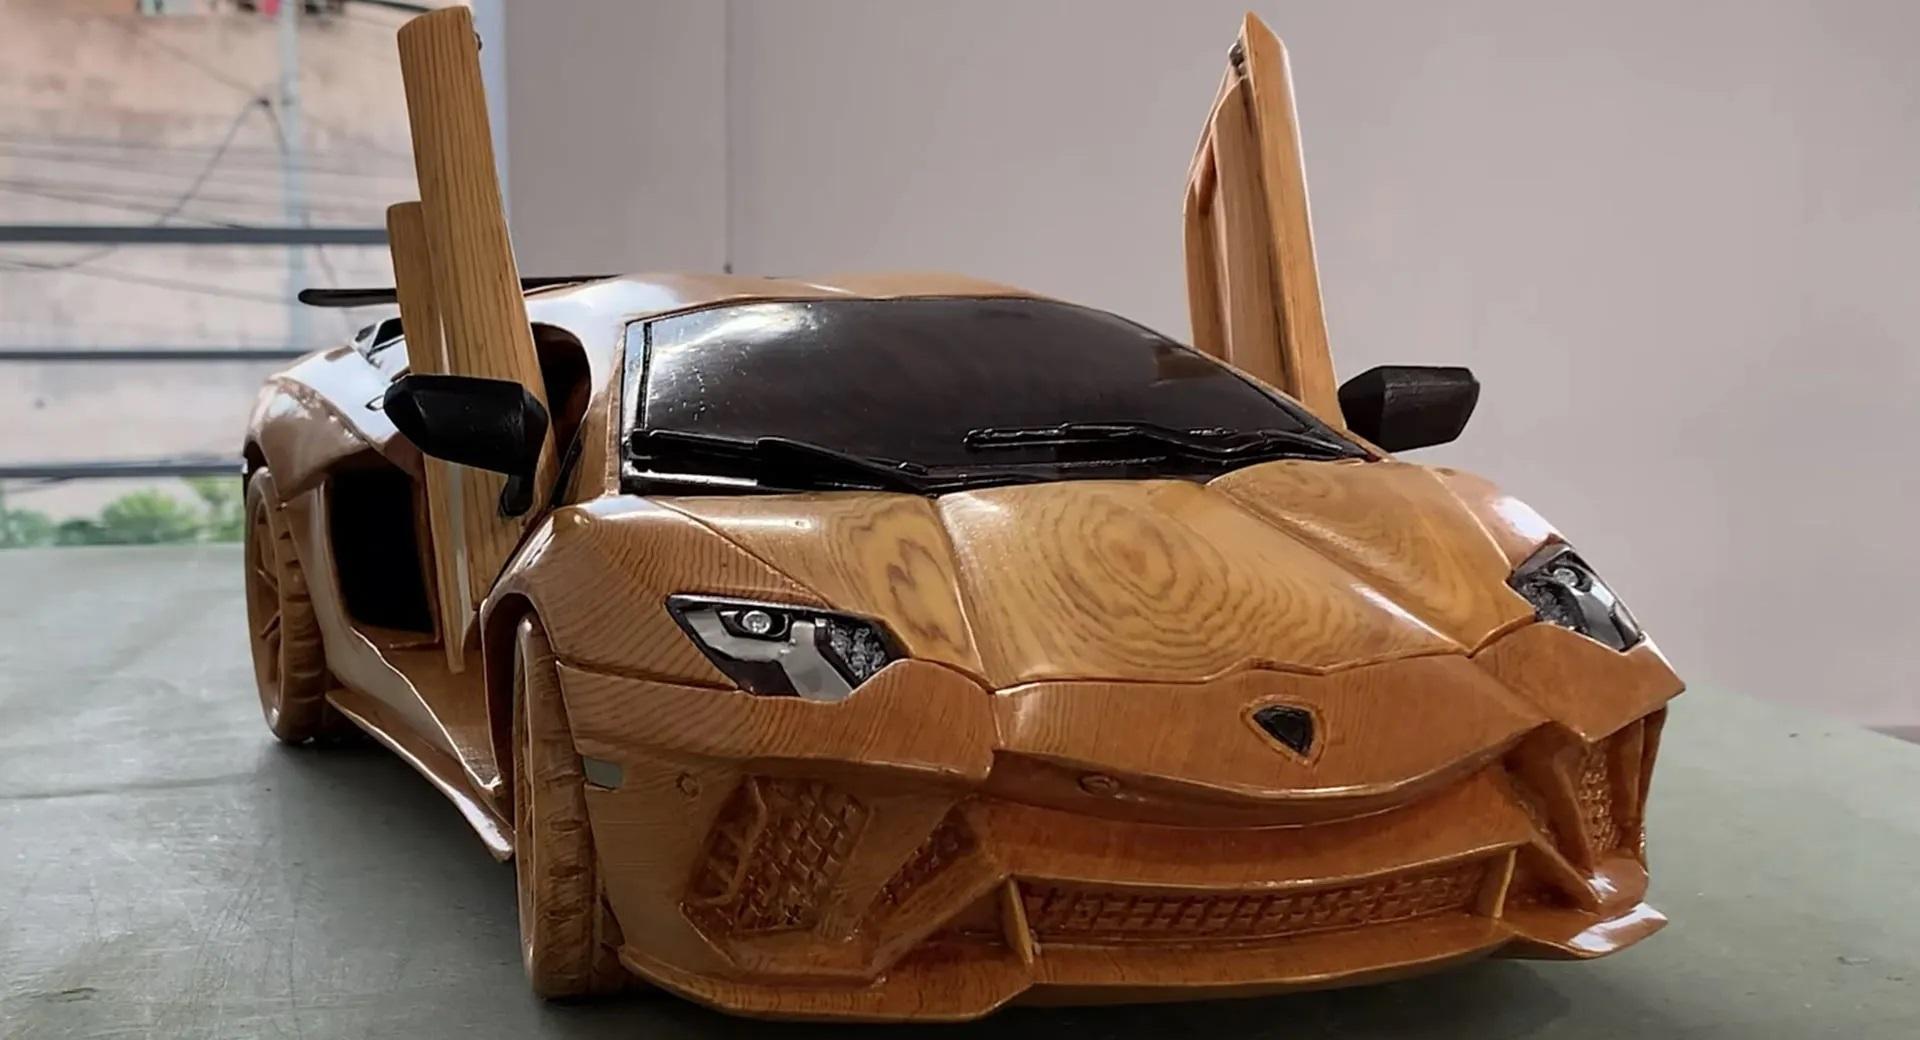 Гиперкар Lamborghini Aventador S вырезали из дерева в масштабе 1:13